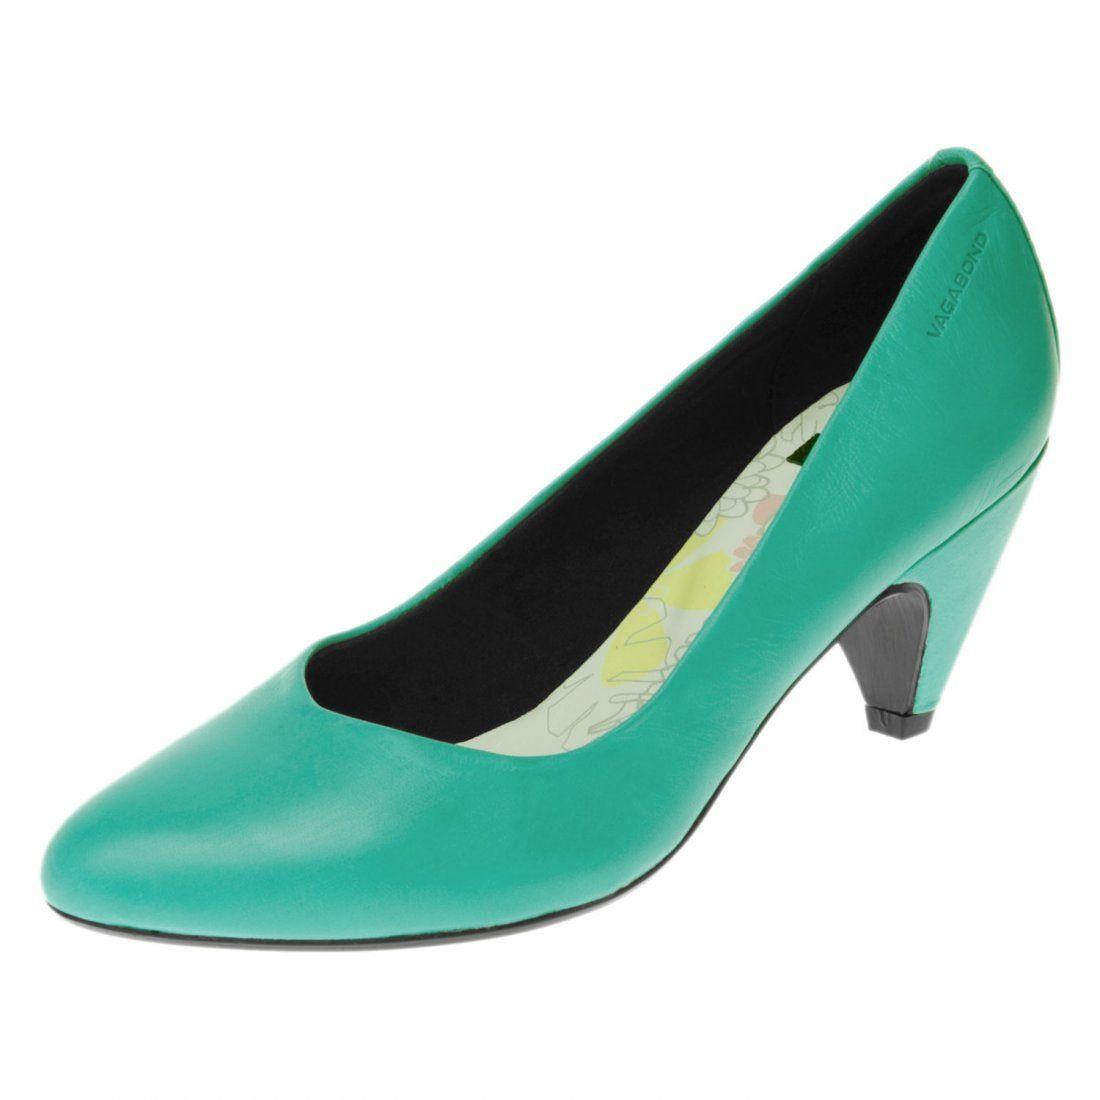 Turquoise Shoes... Yes Please. By Vagabond @ Zalando